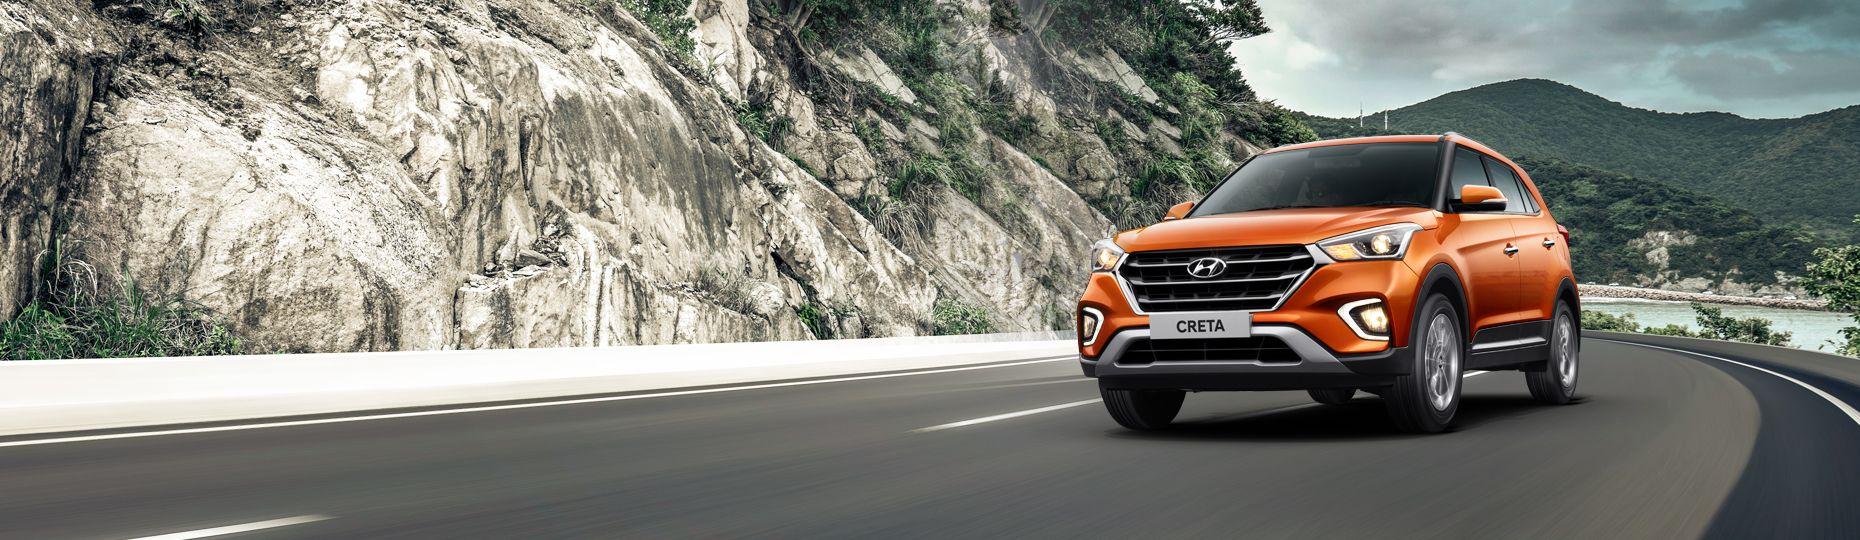 Hyundai Creta Car Price In India In 2020 Hyundai Car Prices New Hyundai